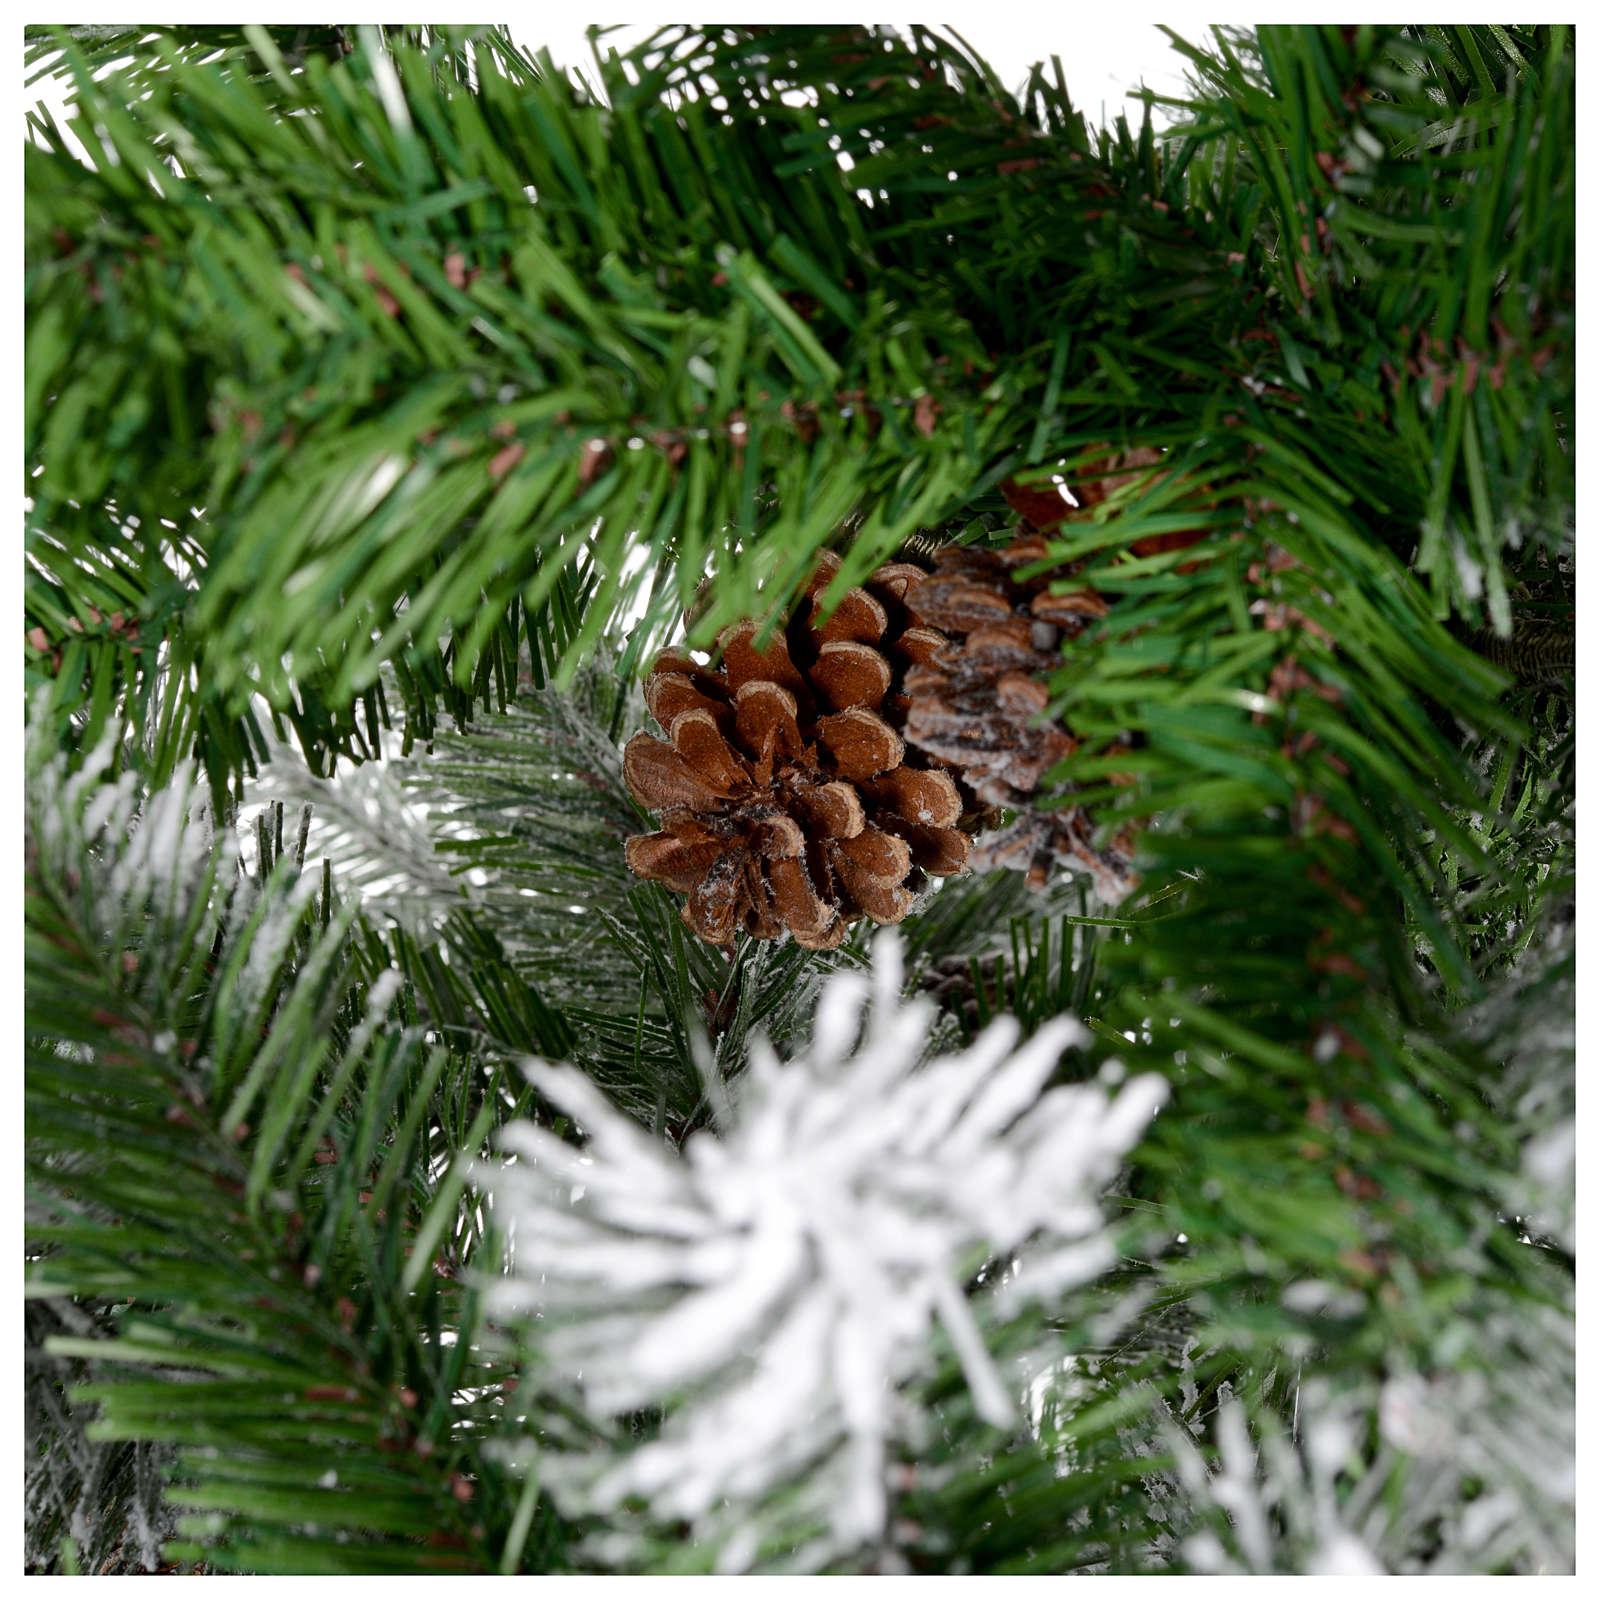 christmas tree 230 cm flocked with pine cones oslo 3 - Christmas Tree With Pine Cones